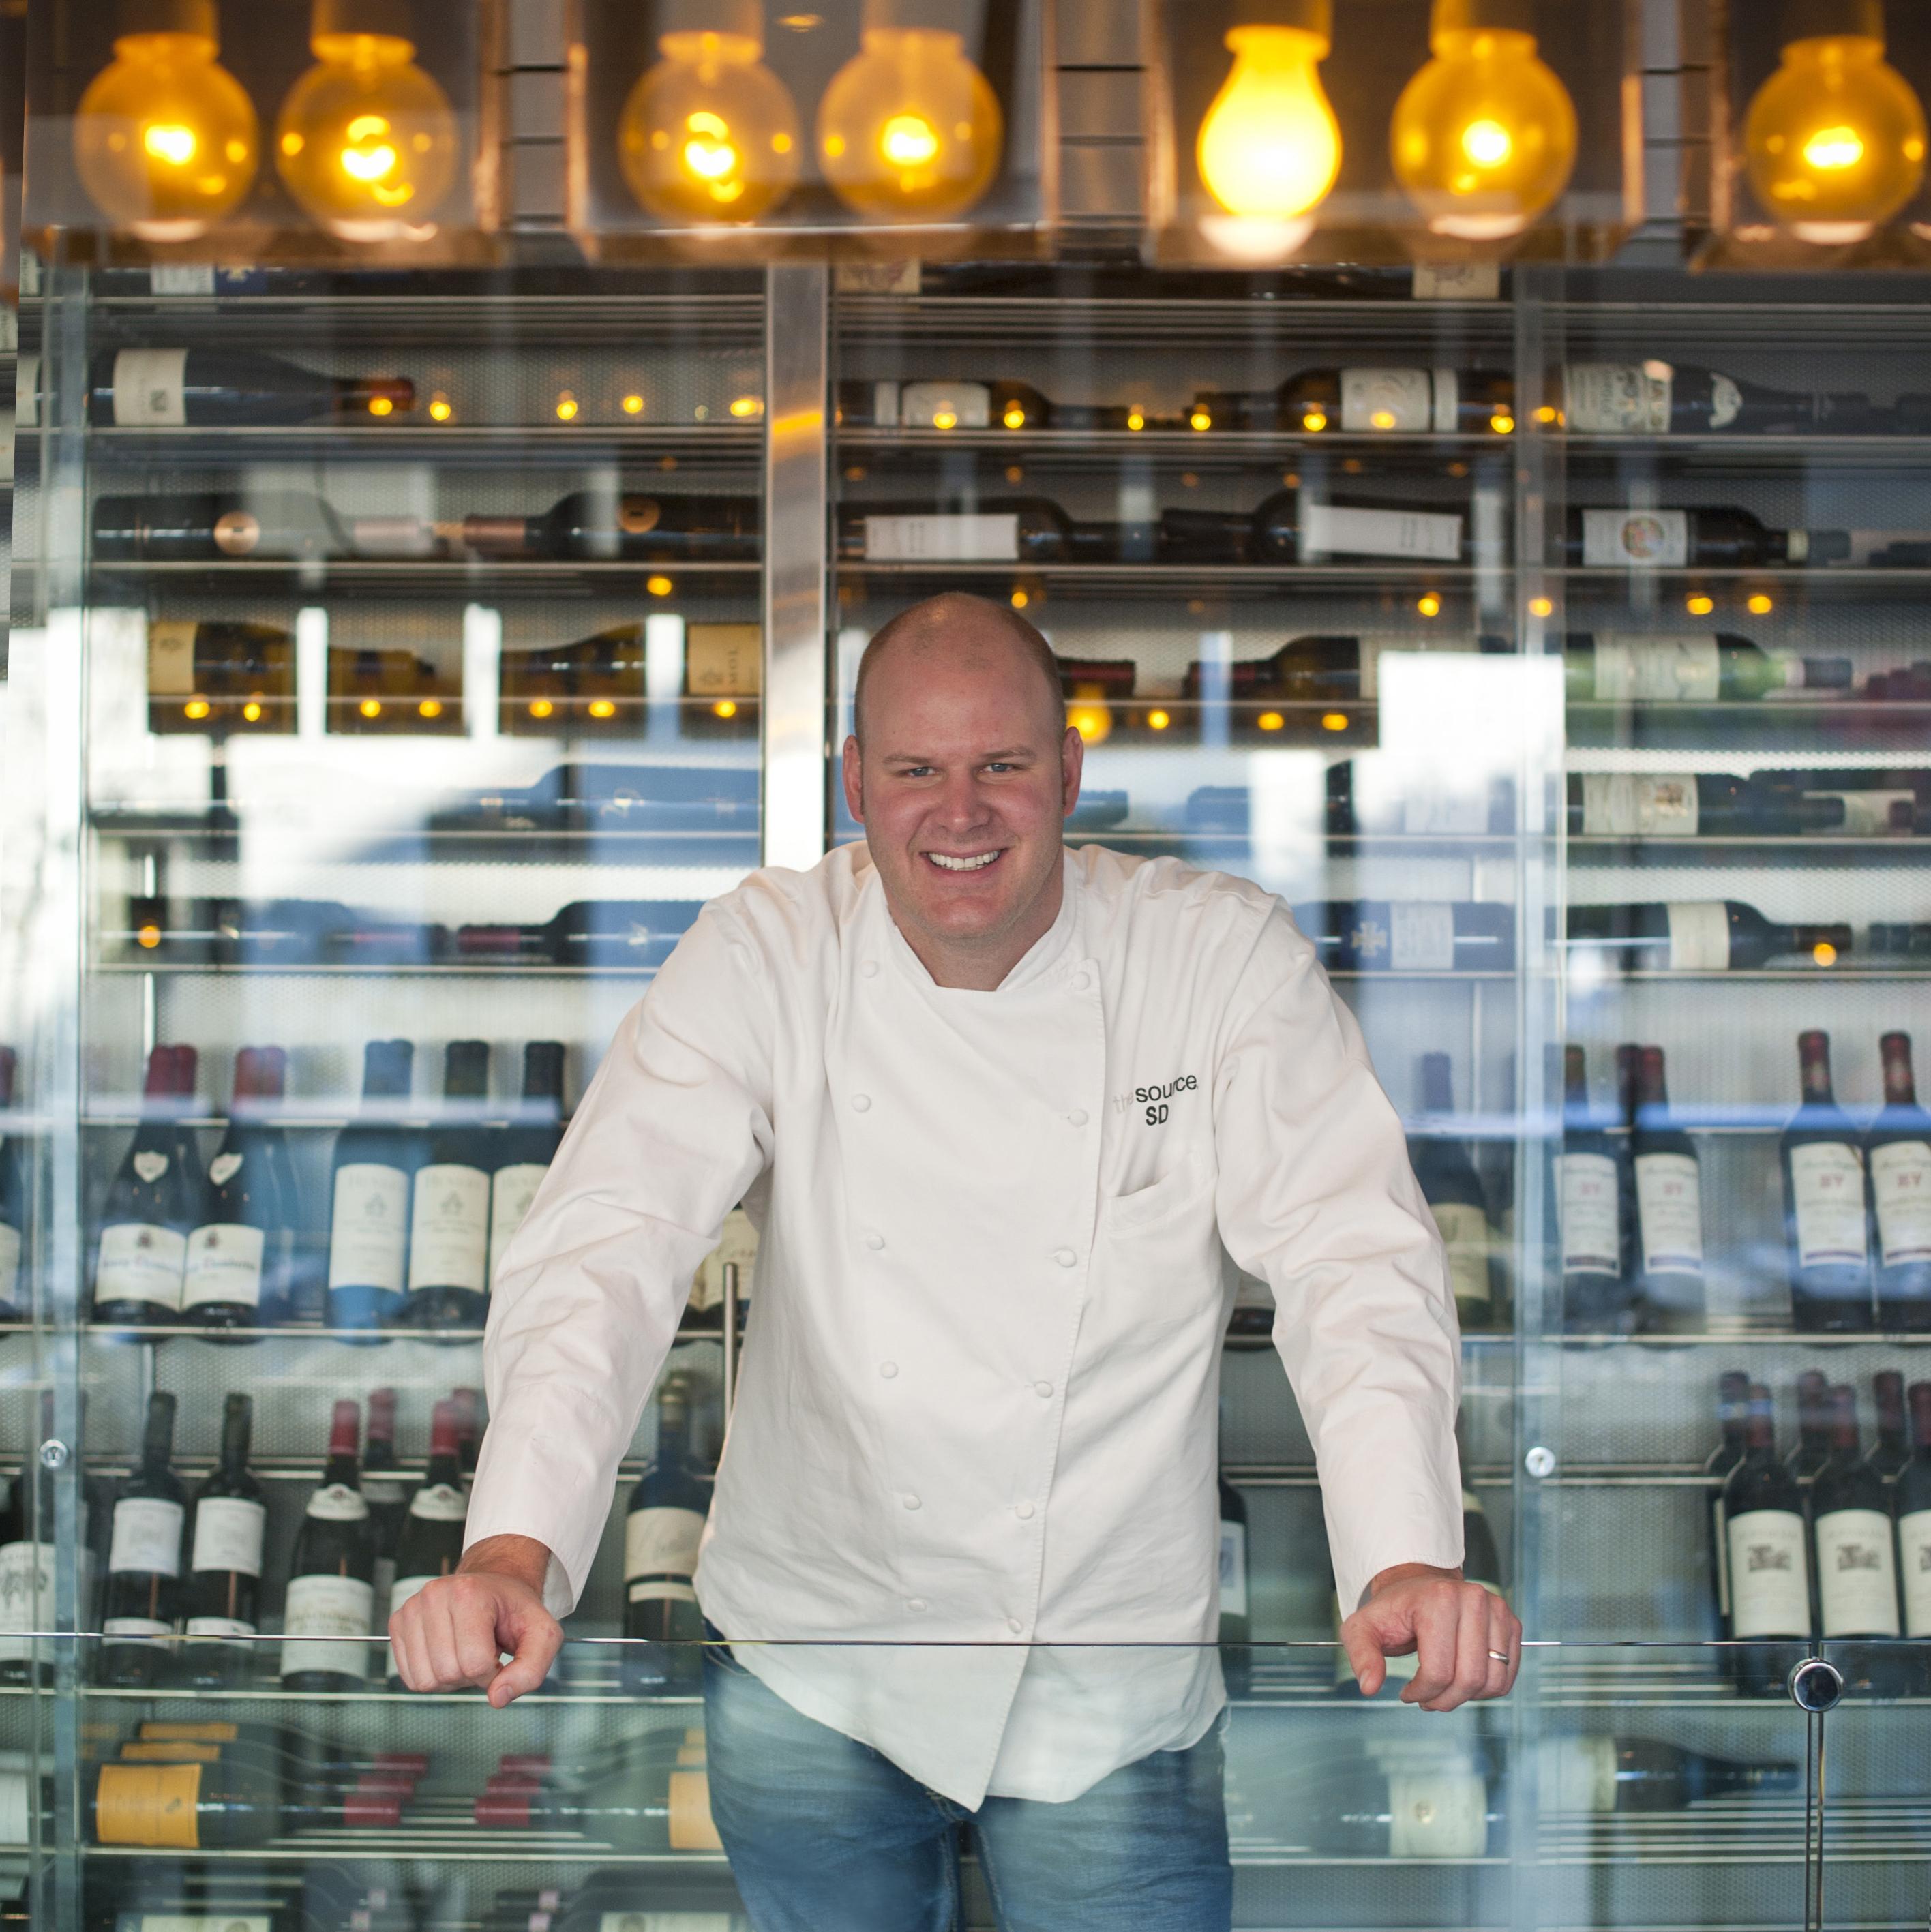 Chef Scott Drewno at The Source in Washington, D.C.